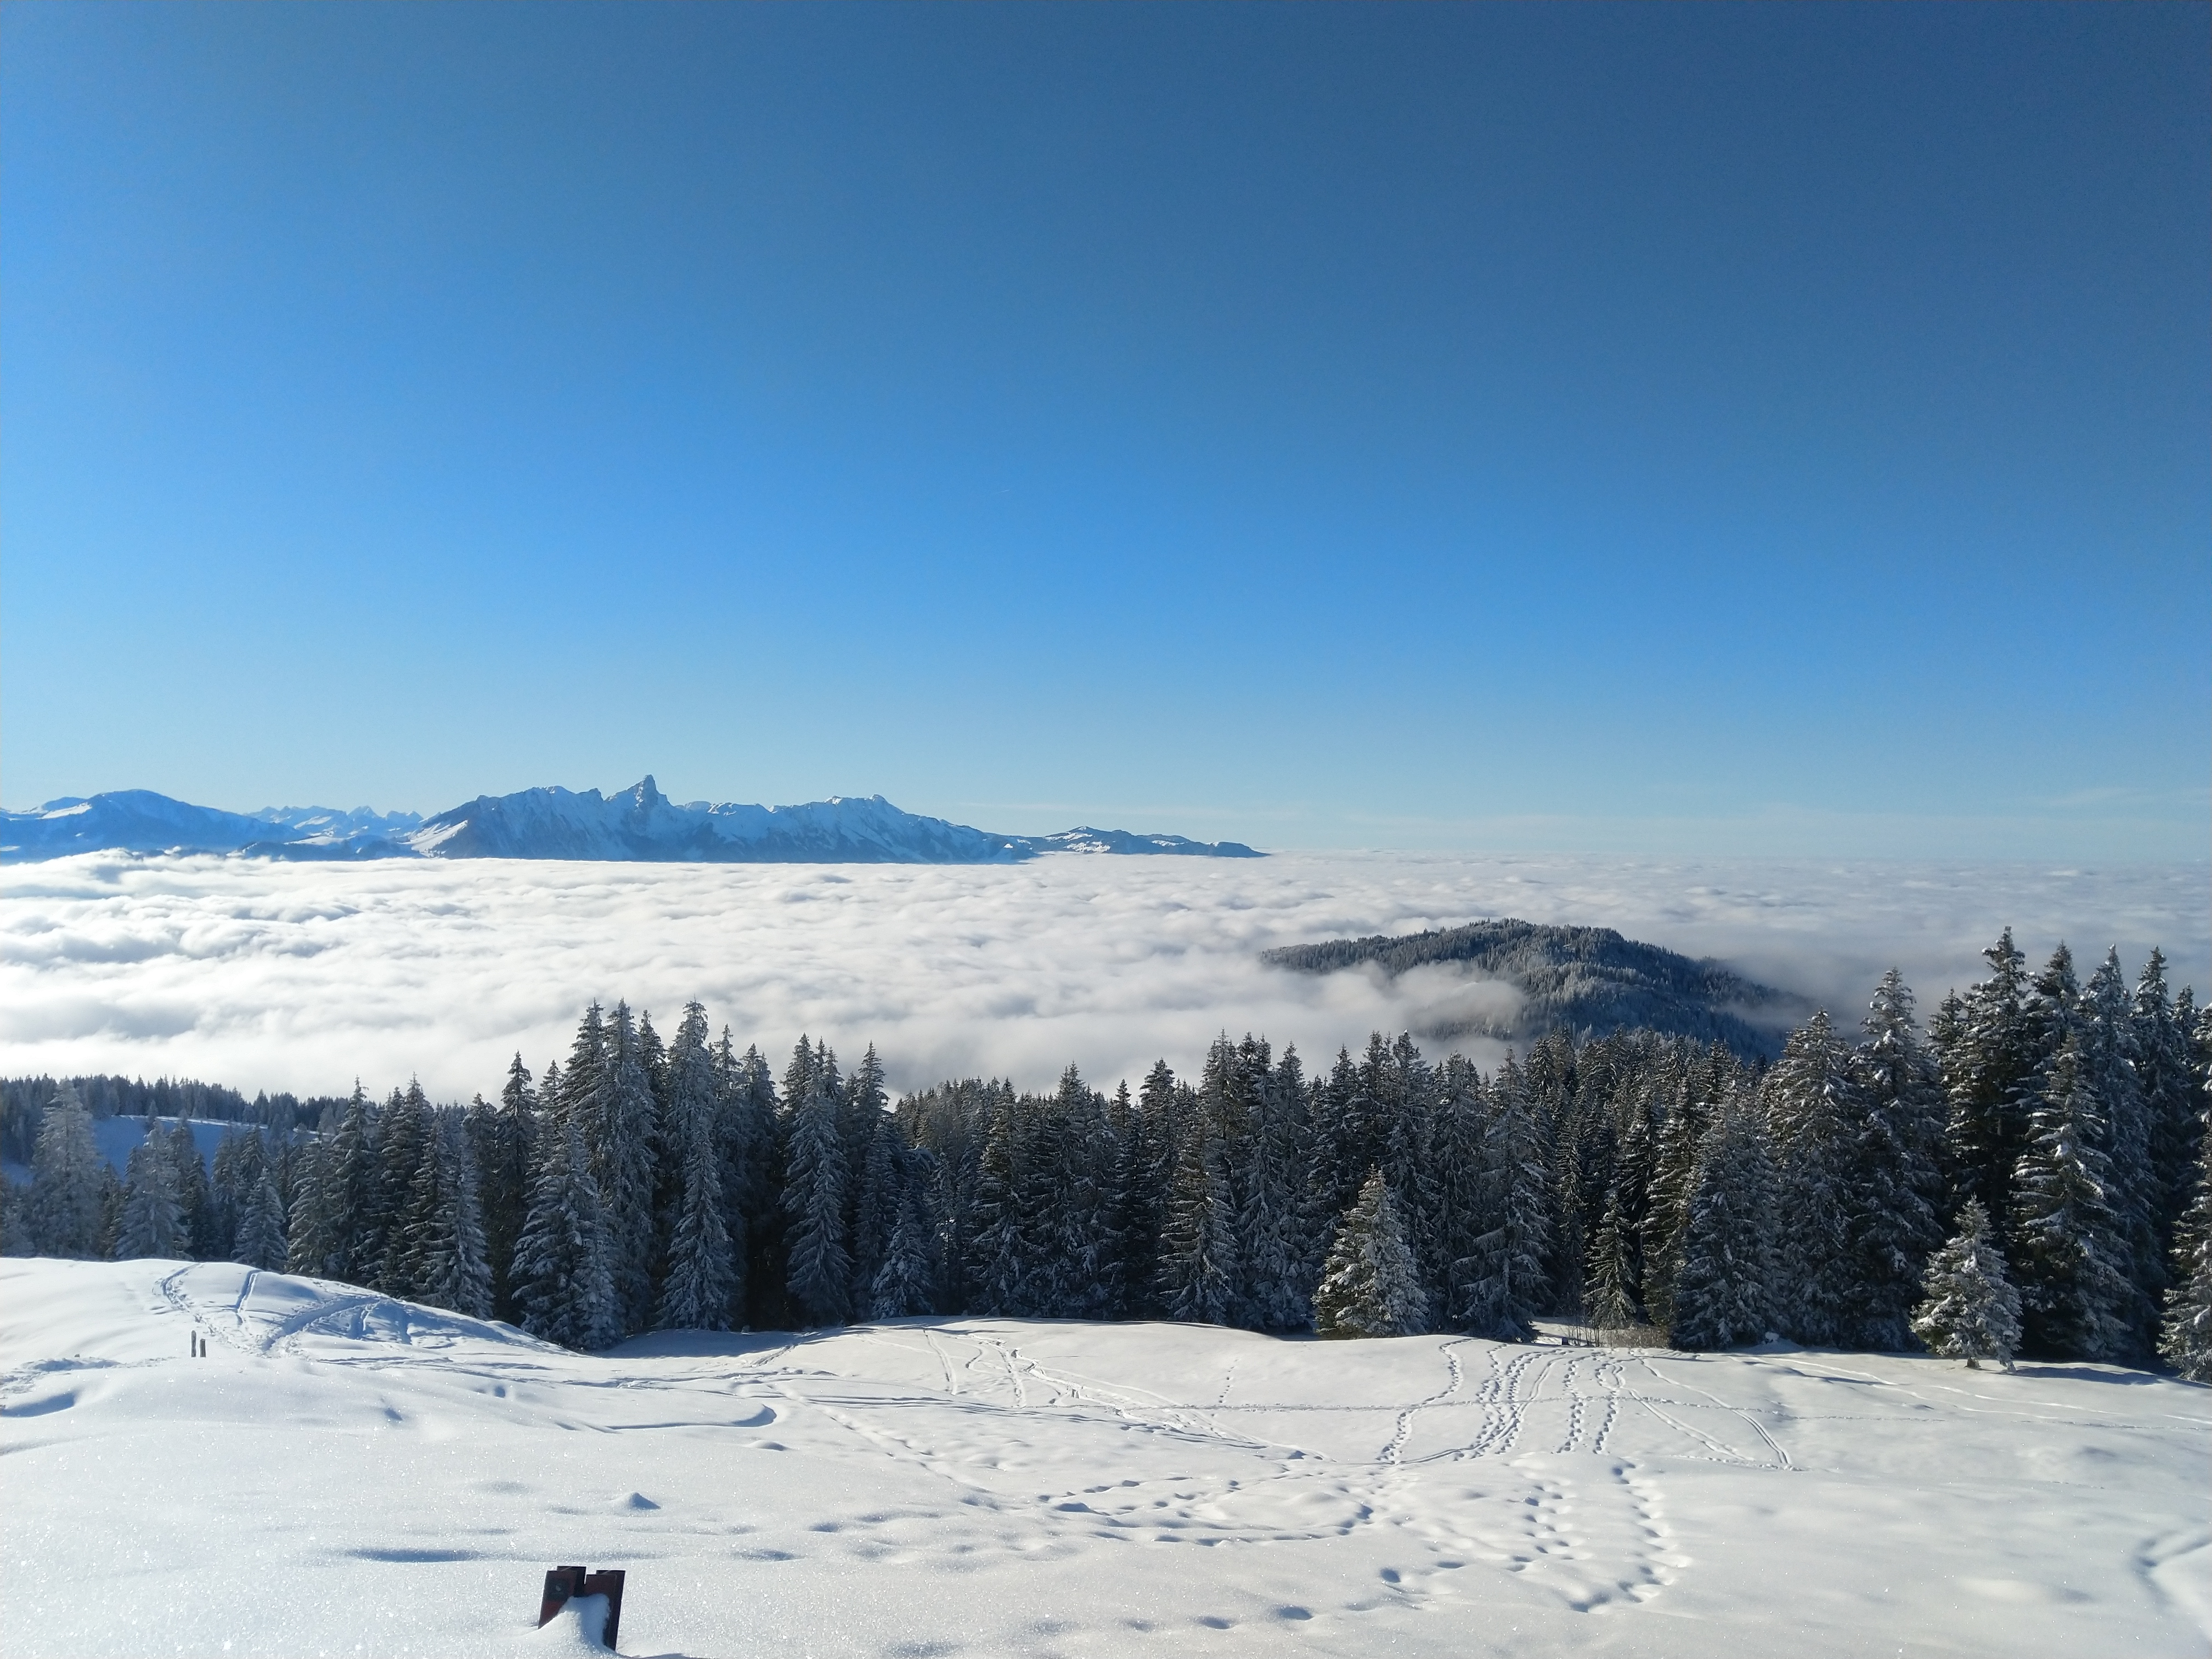 Nebelmeer mit dem Stockhorn - Schneeschuhwanderung Schwanden